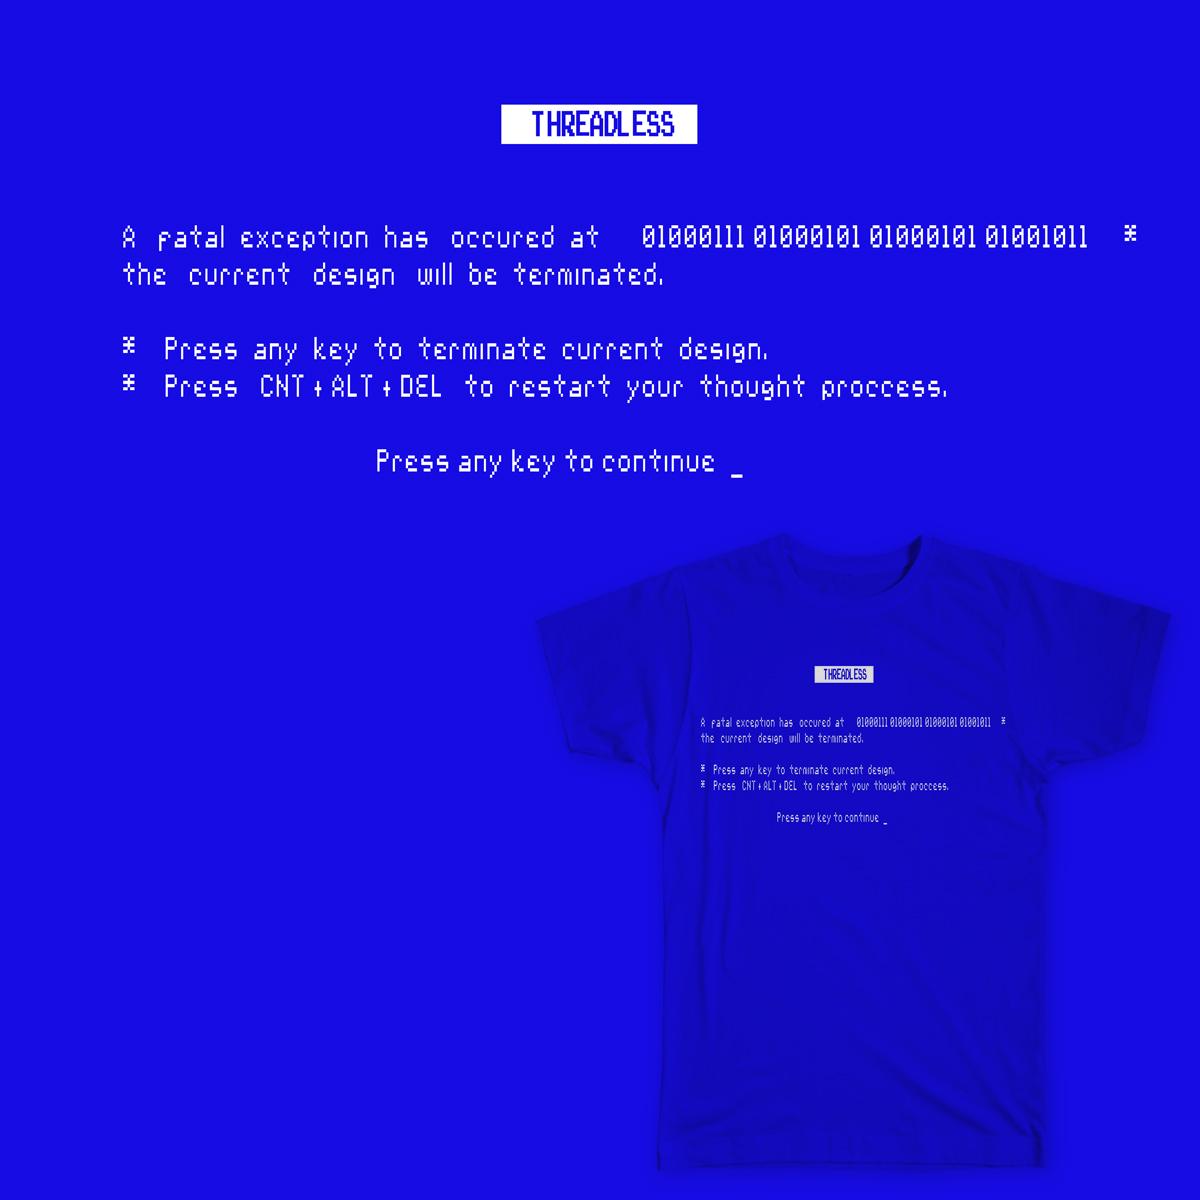 IM BLUE by Nossotros on Threadless